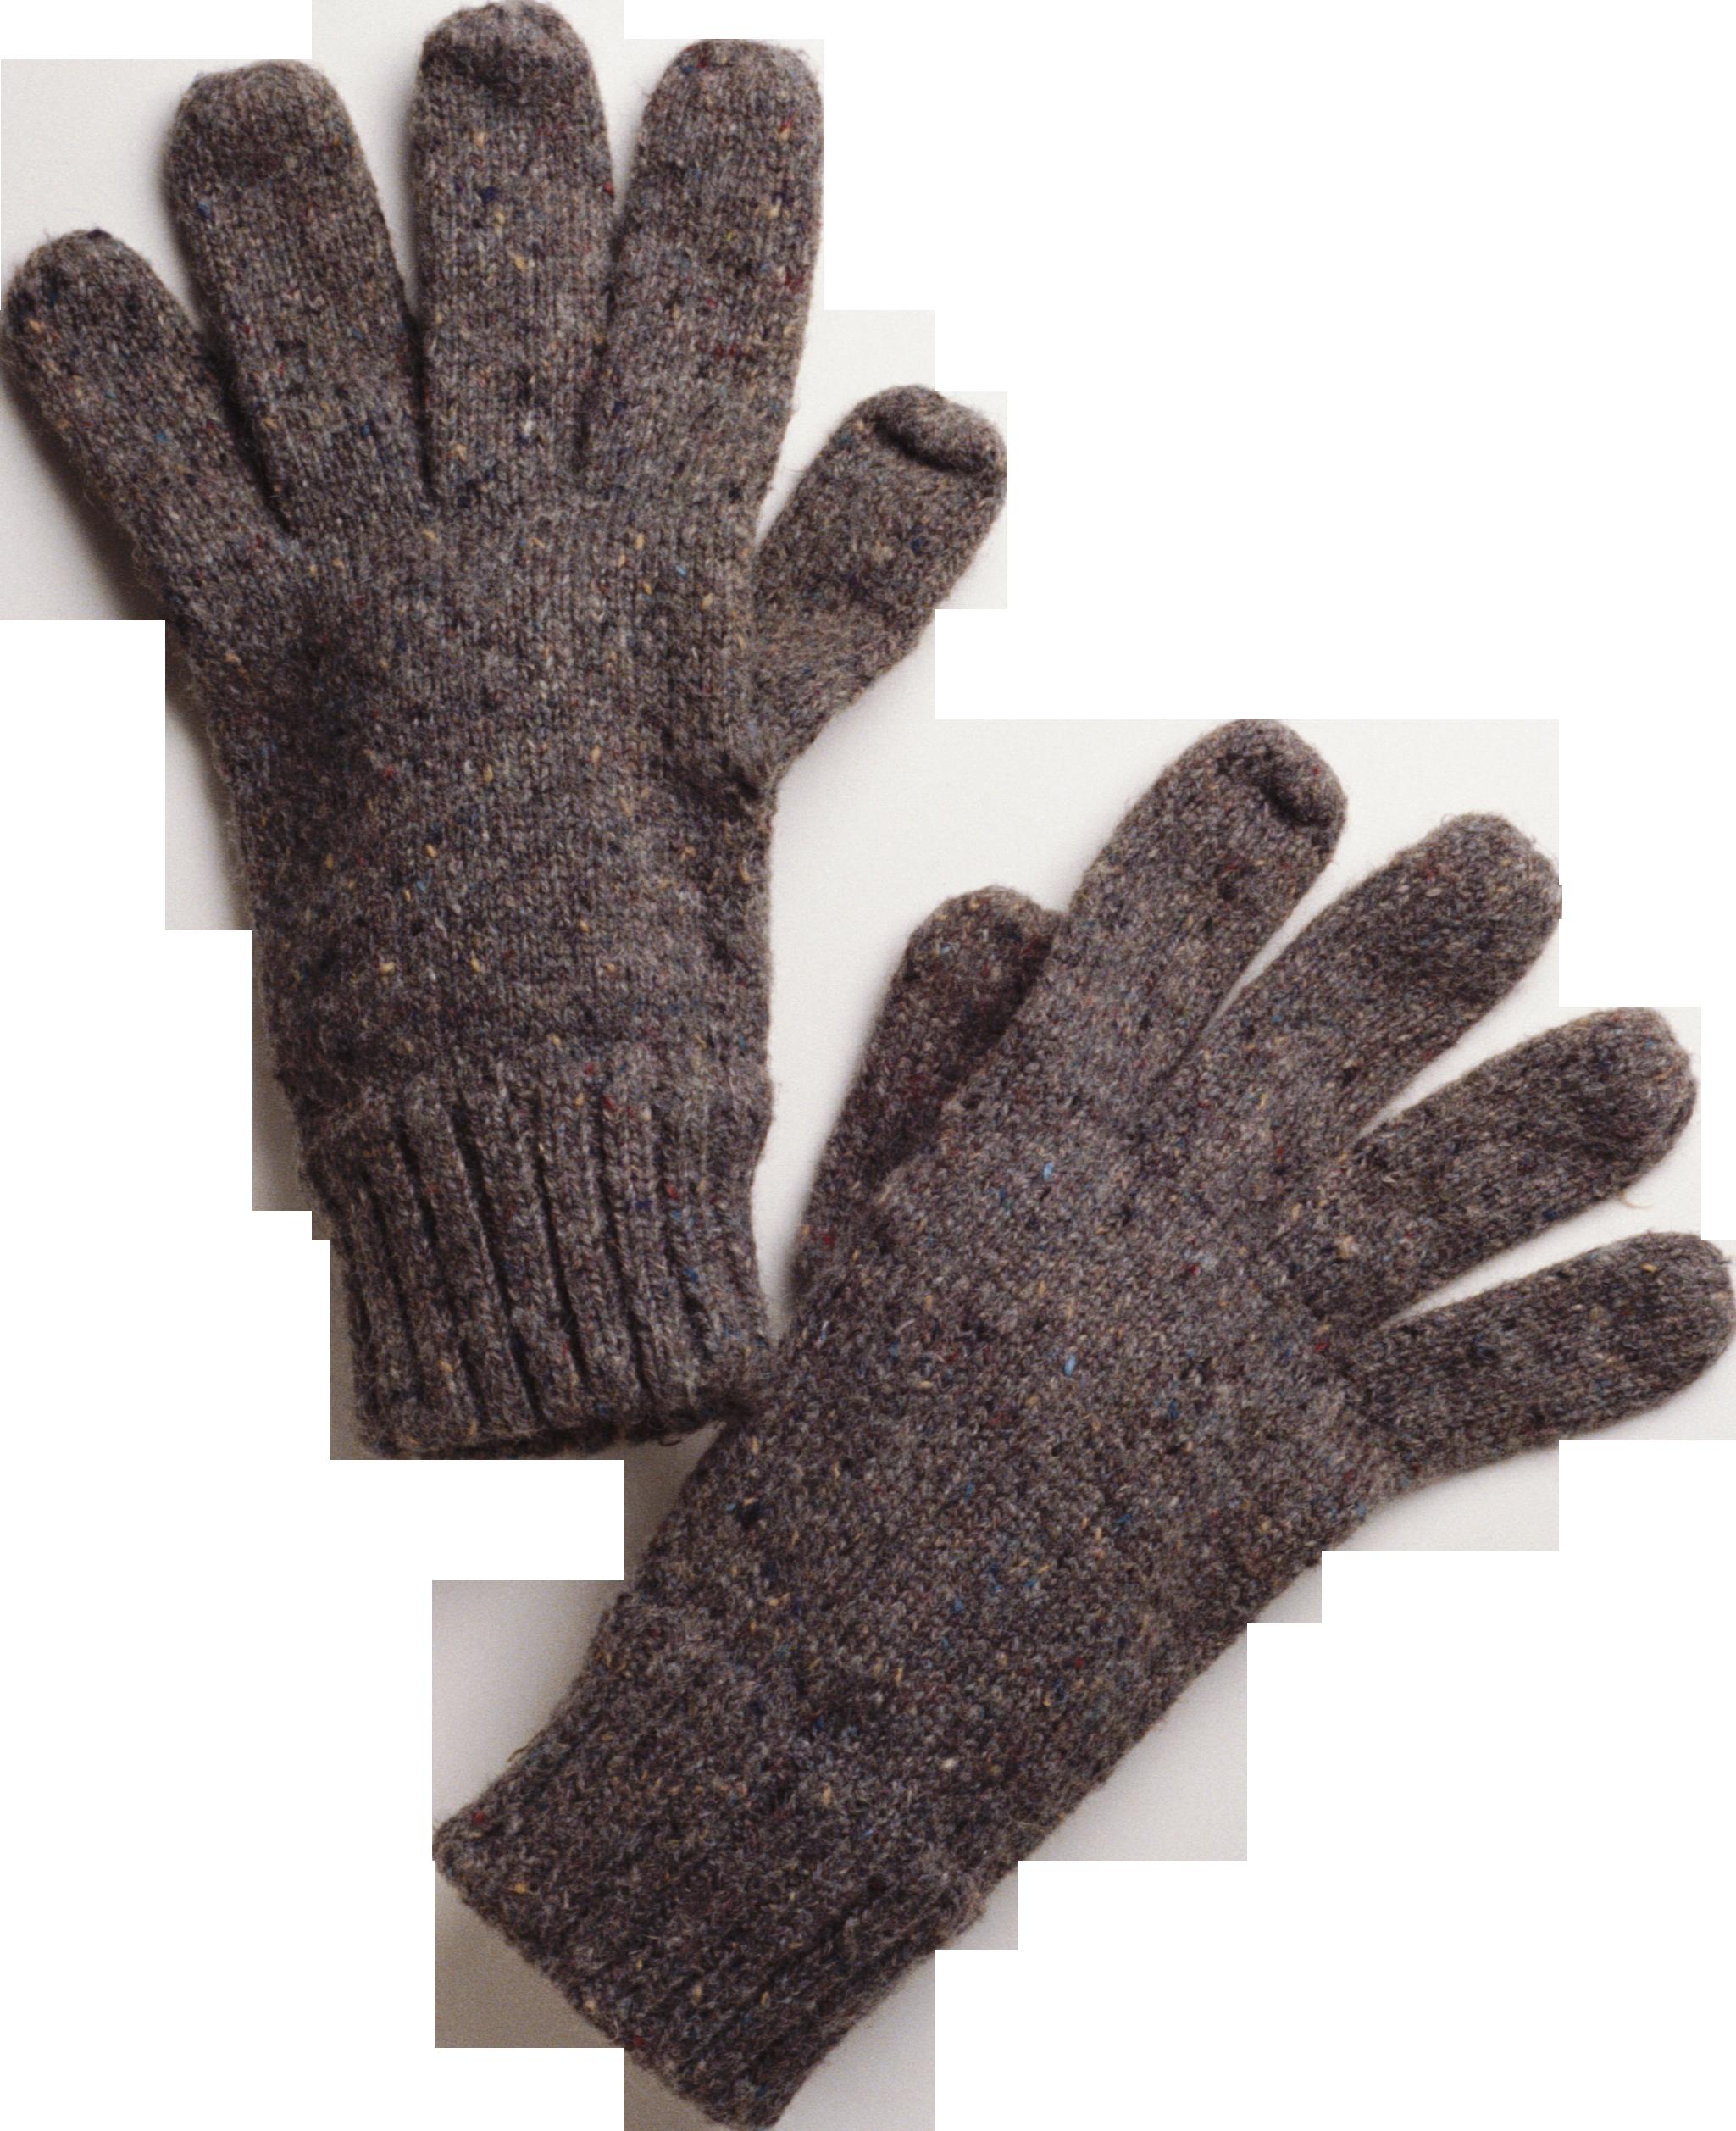 Glove clipart warm glove. Winter gloves png image